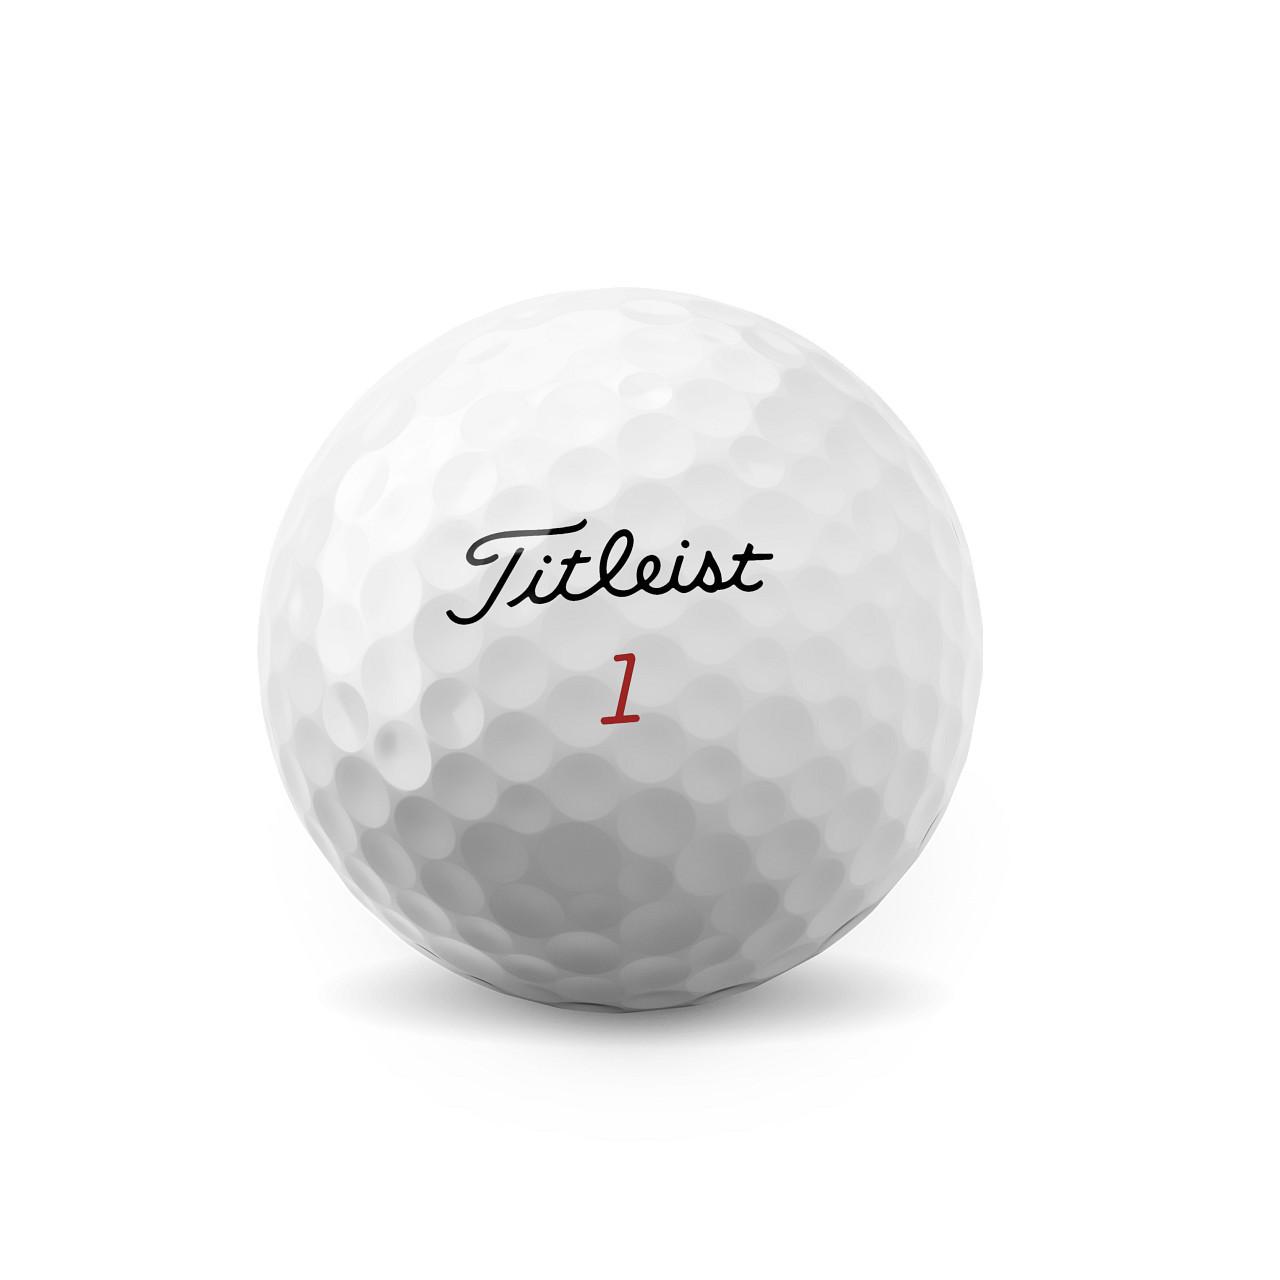 Titleist Pro V1X Dozen Golf Balls 2021 - Low Numbers (#1 - #4)